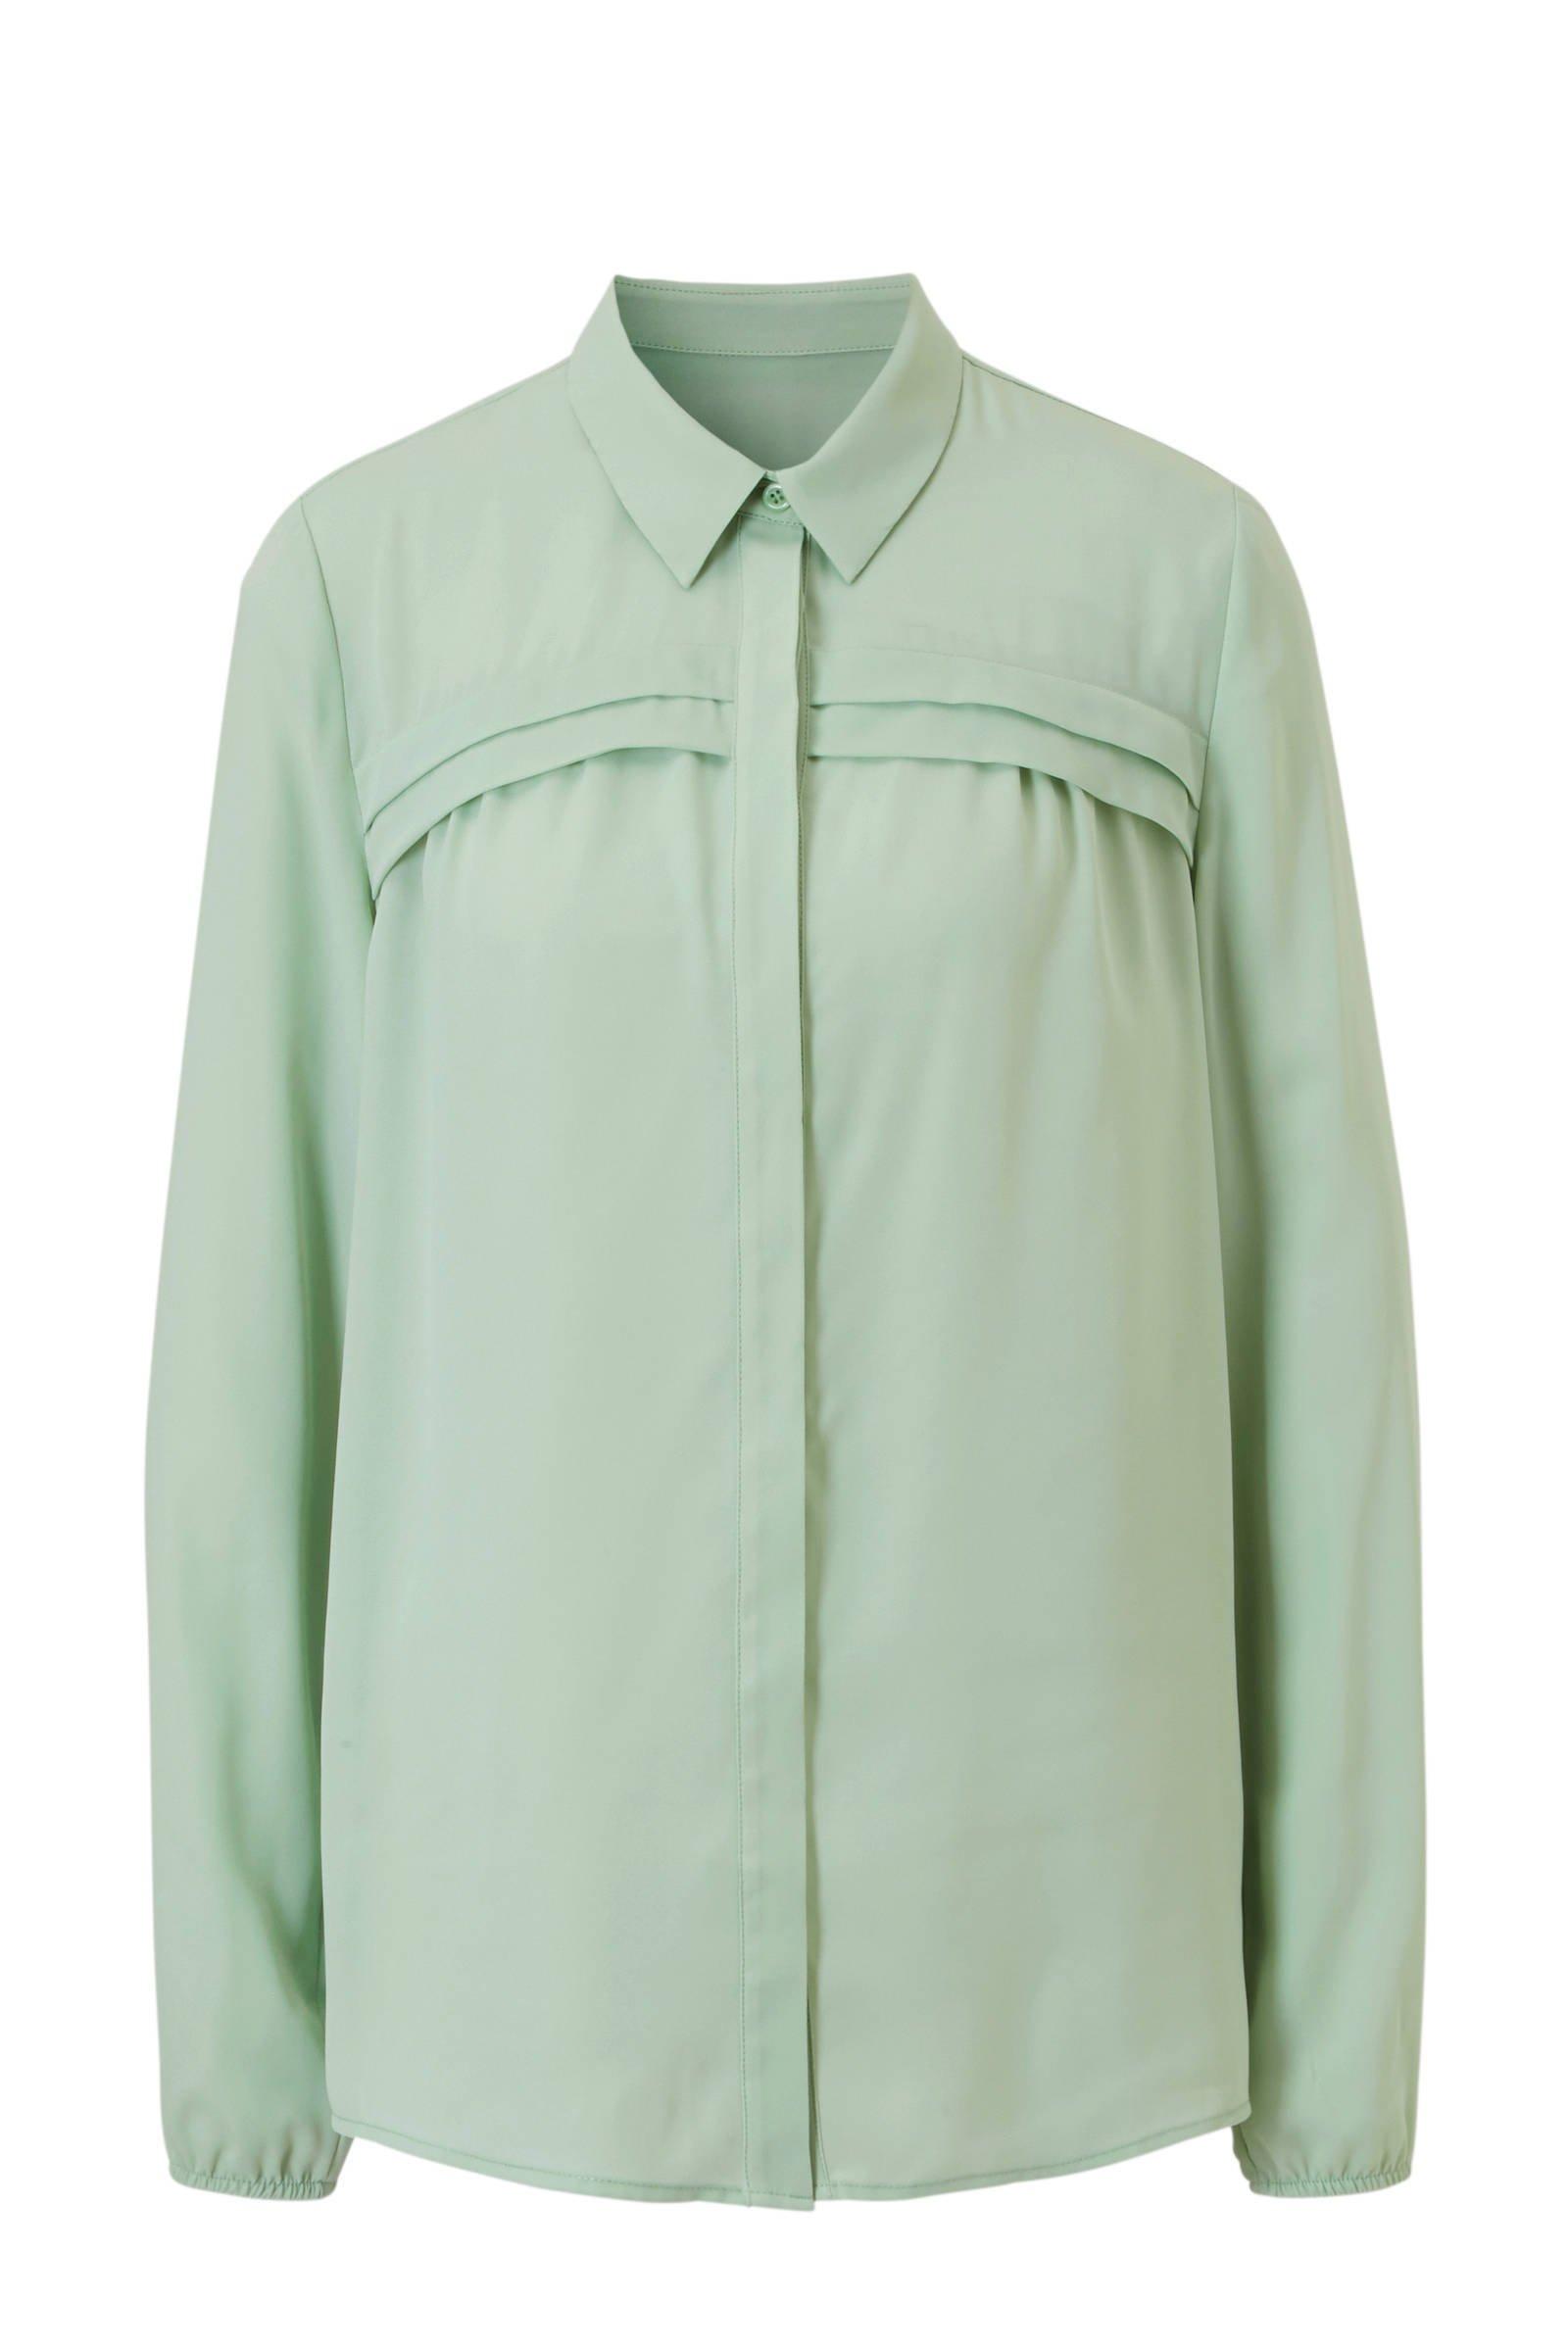 whkmp's own vest jas | wehkamp